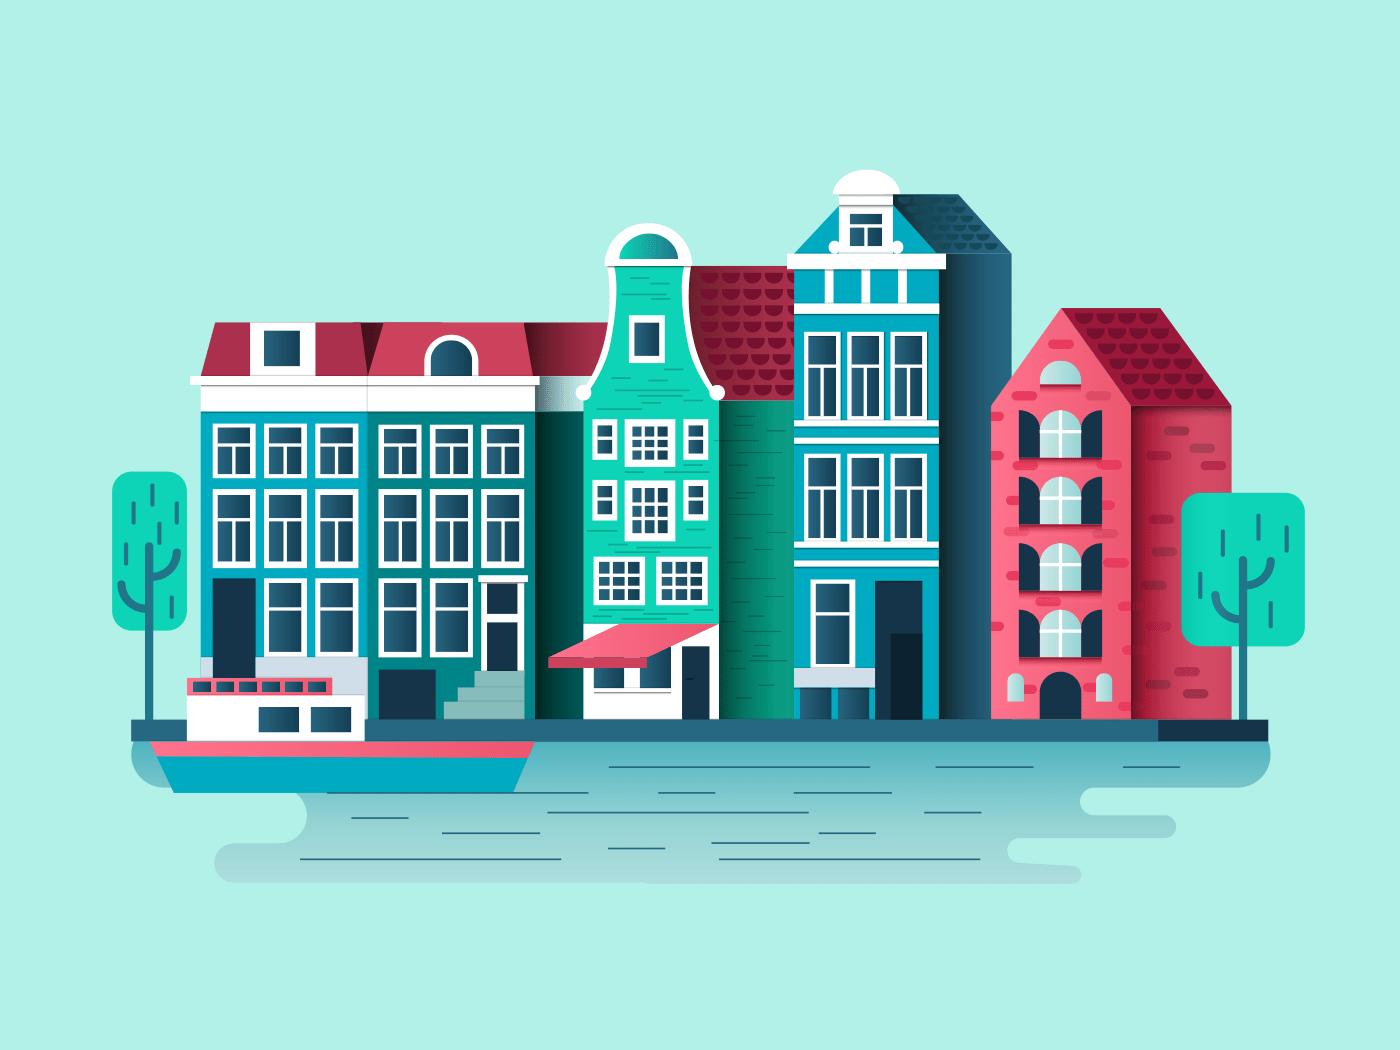 Amsterdam city design illustration